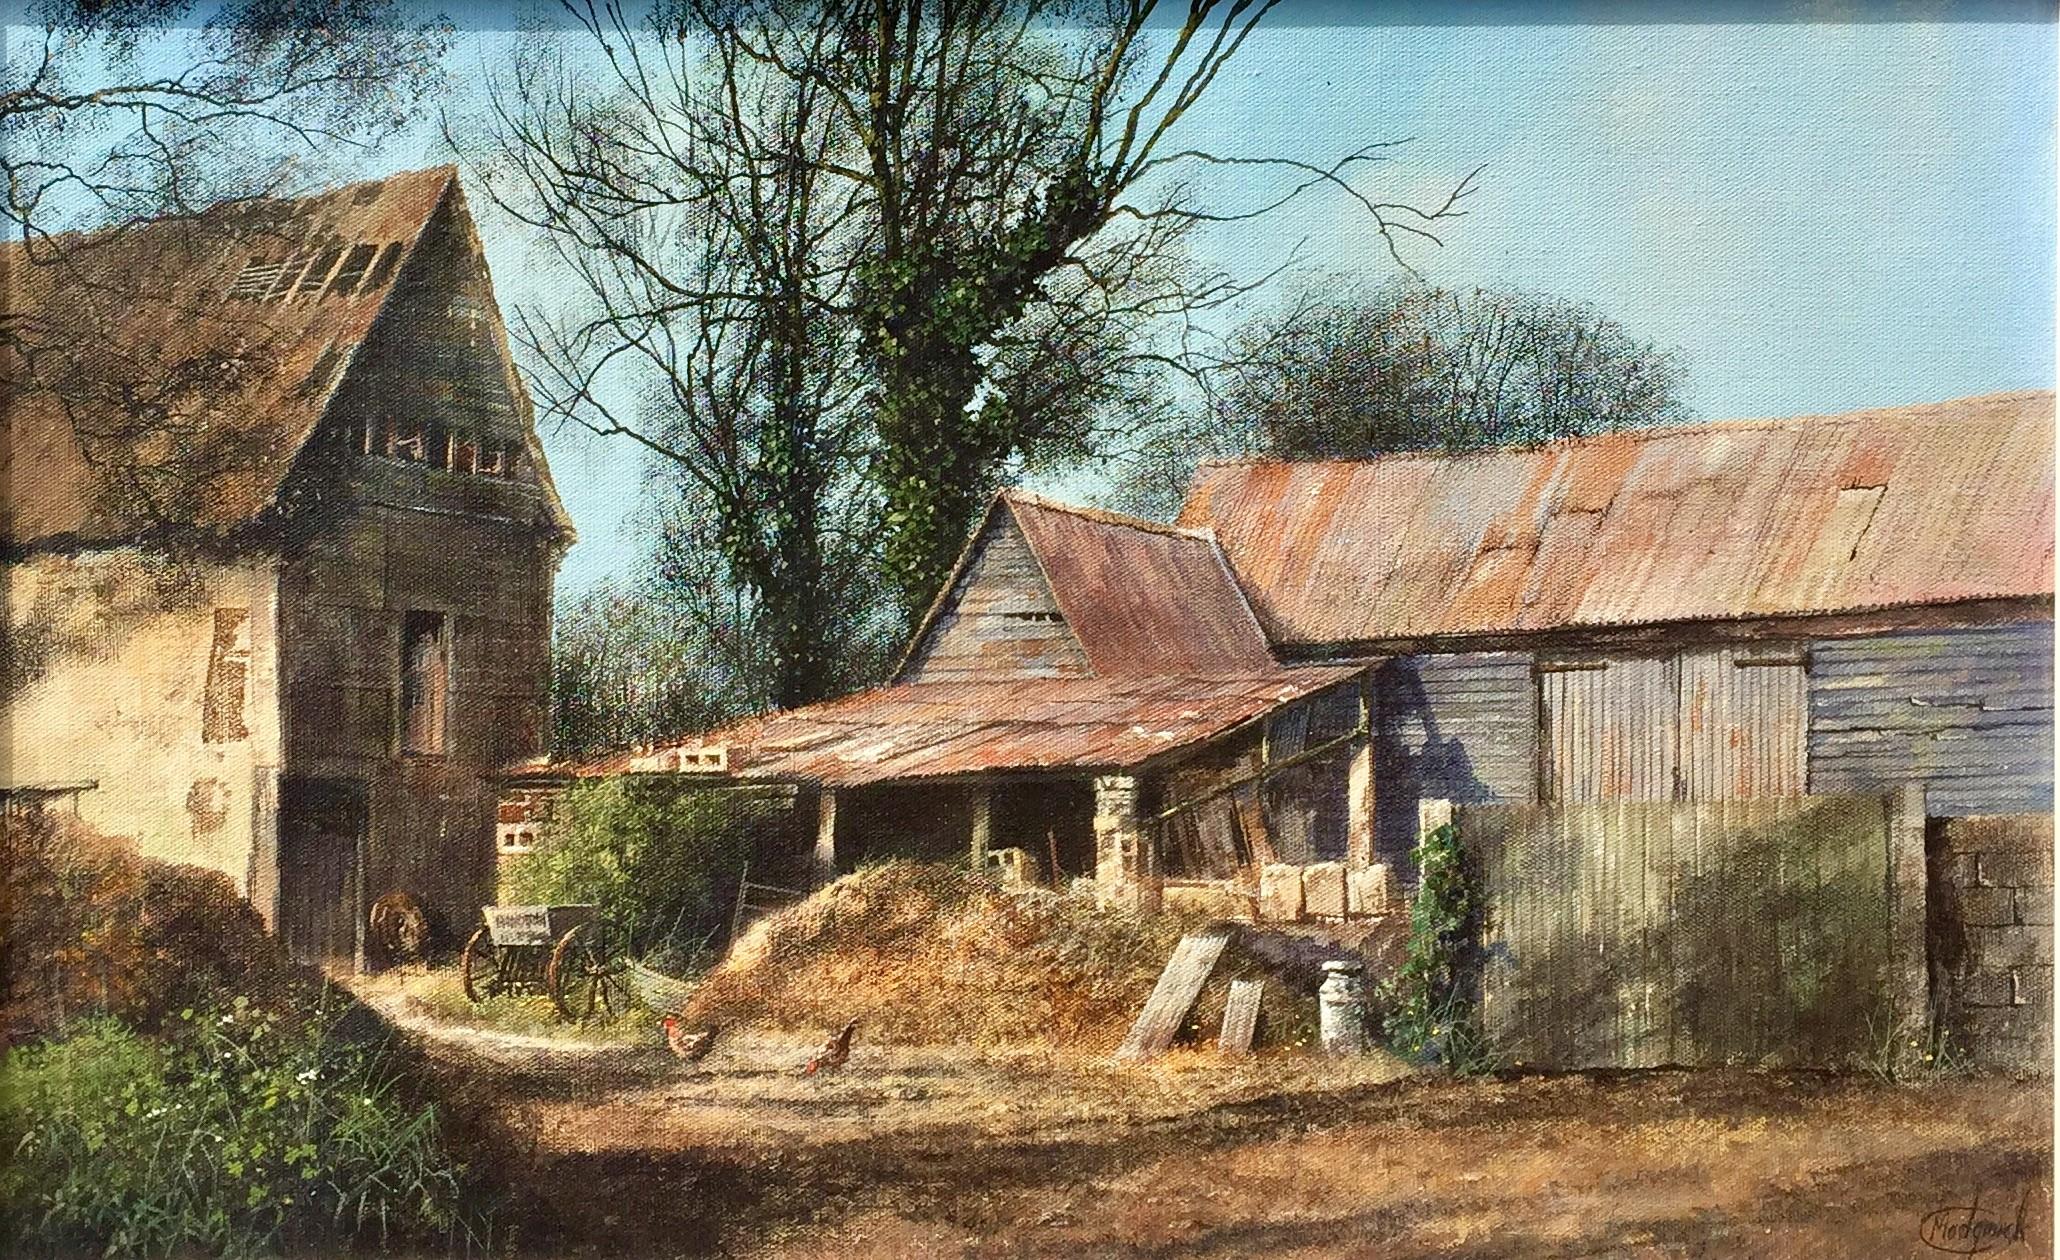 The Old Farm Barn - SOLD